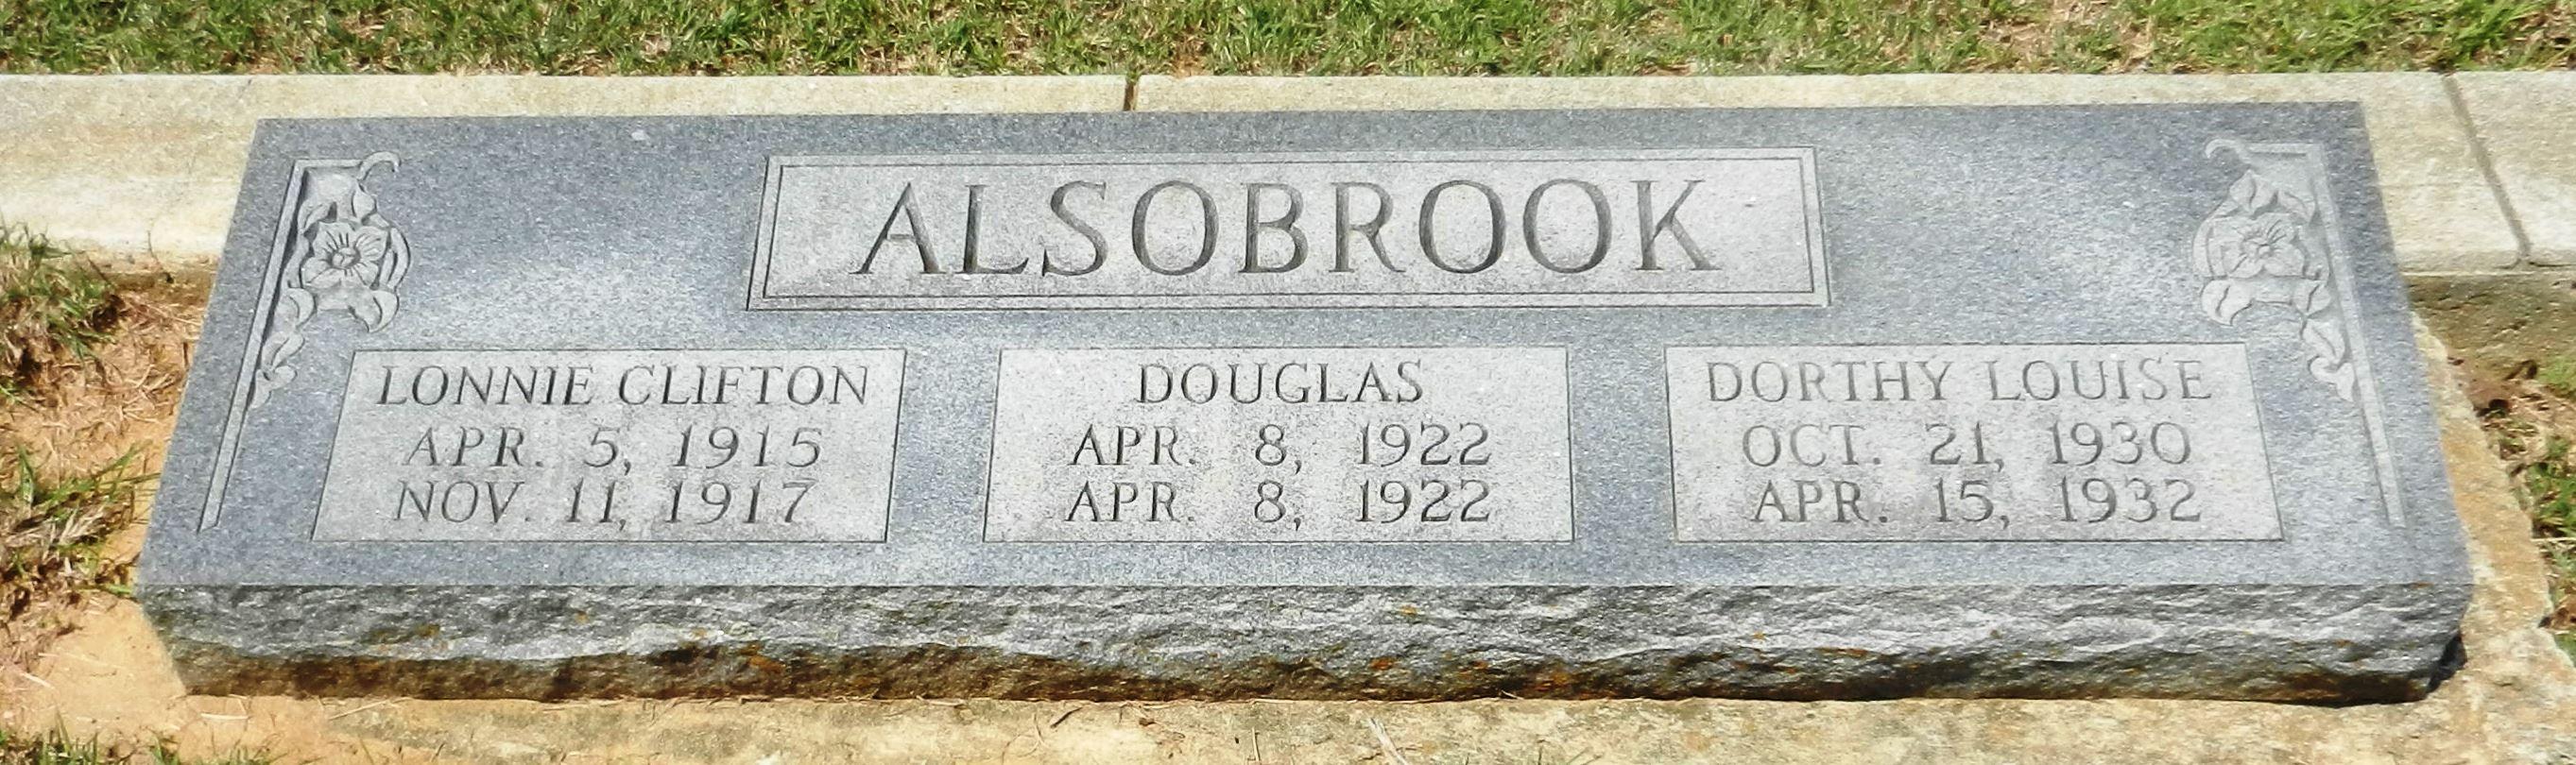 Dorthy Louise Alsobrook